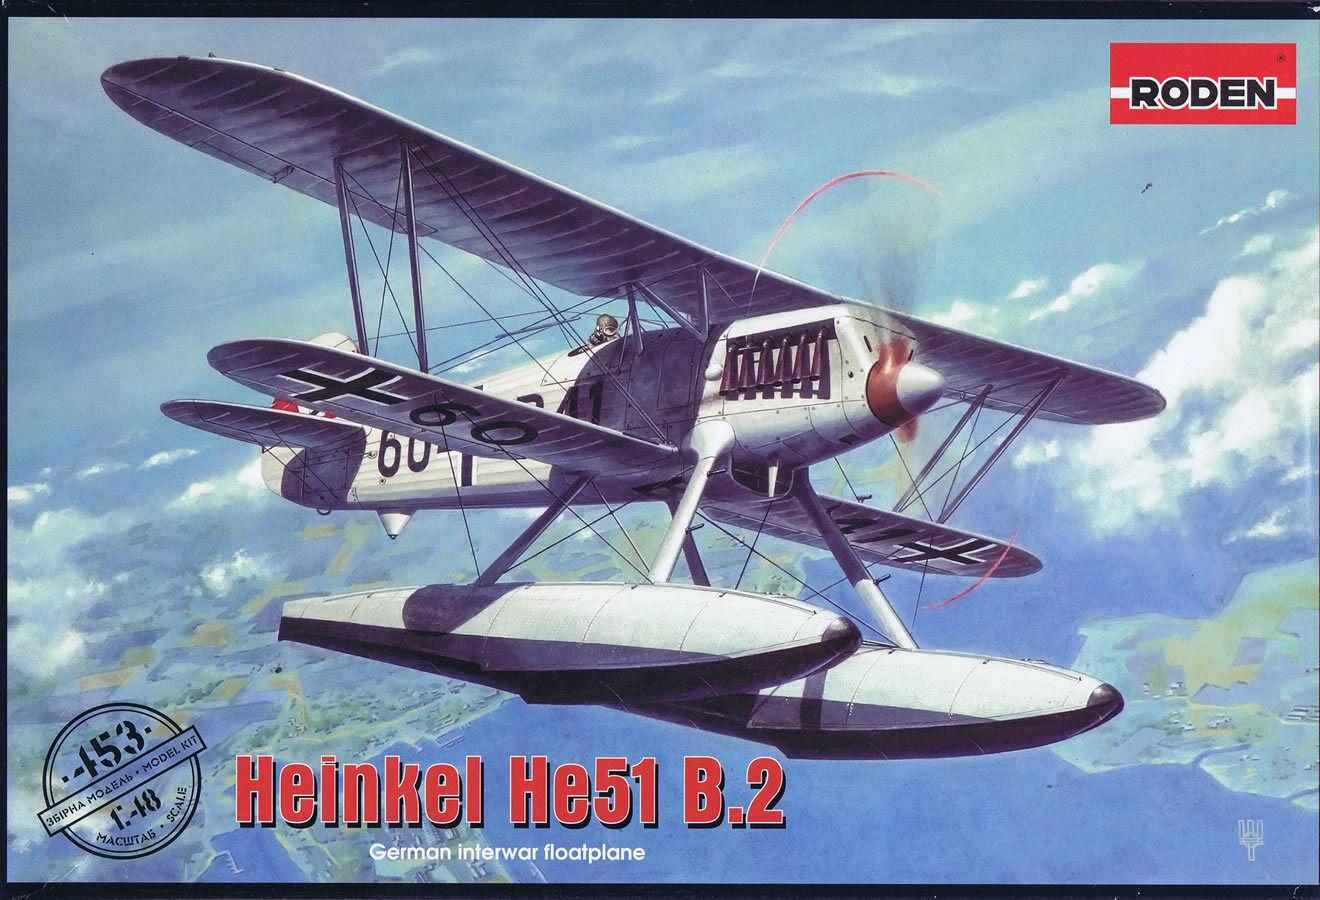 Roden 1 48 Heinkel He 51B-2 float plane